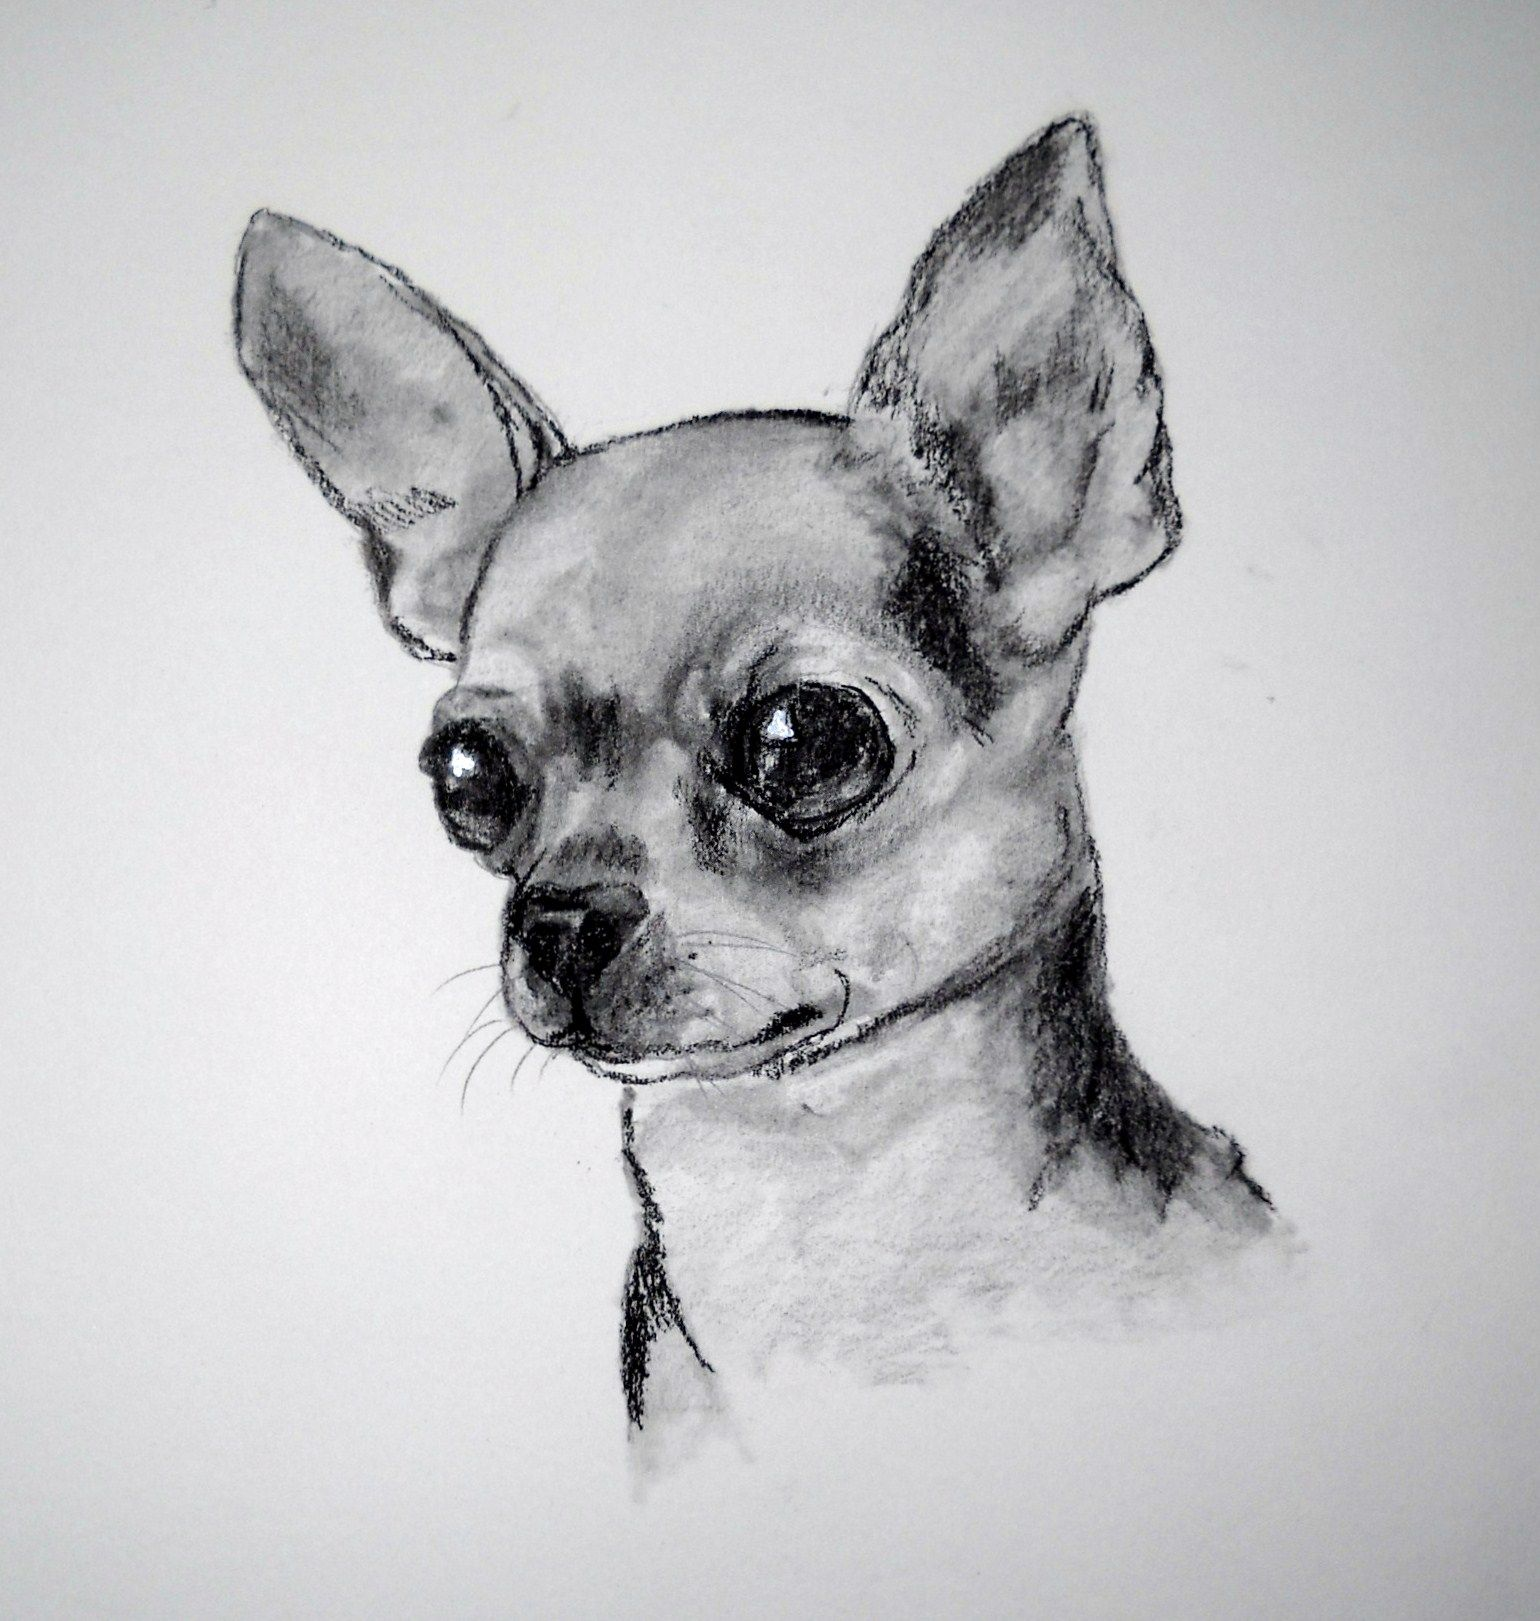 Dachshund Clube Chihuahua Drawing Chihuahua Art Dog Paintings